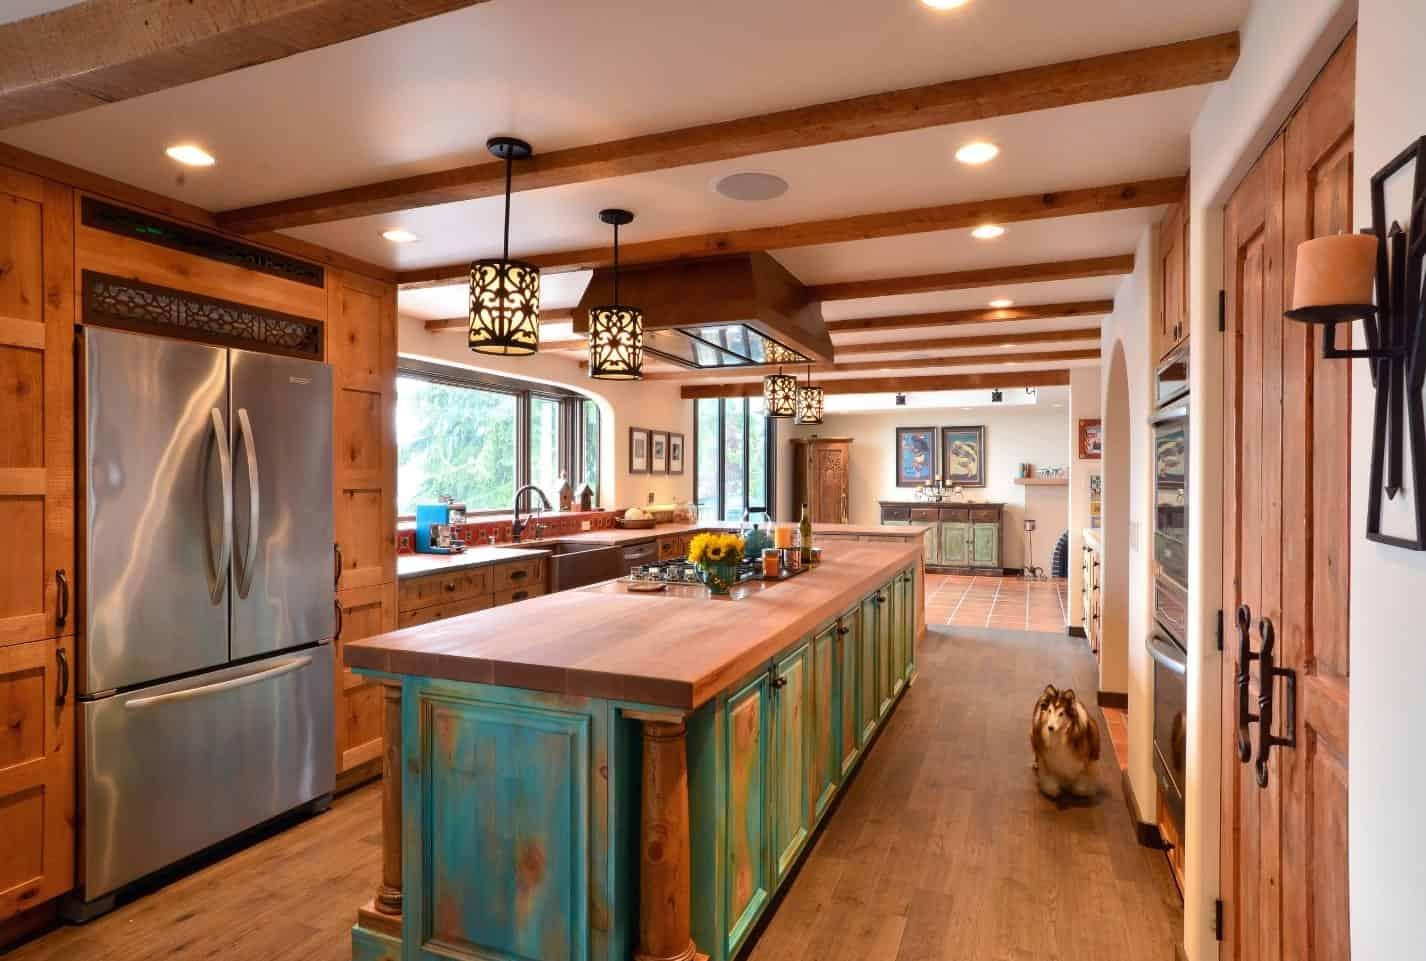 50 Southwestern Kitchen Ideas For 2019